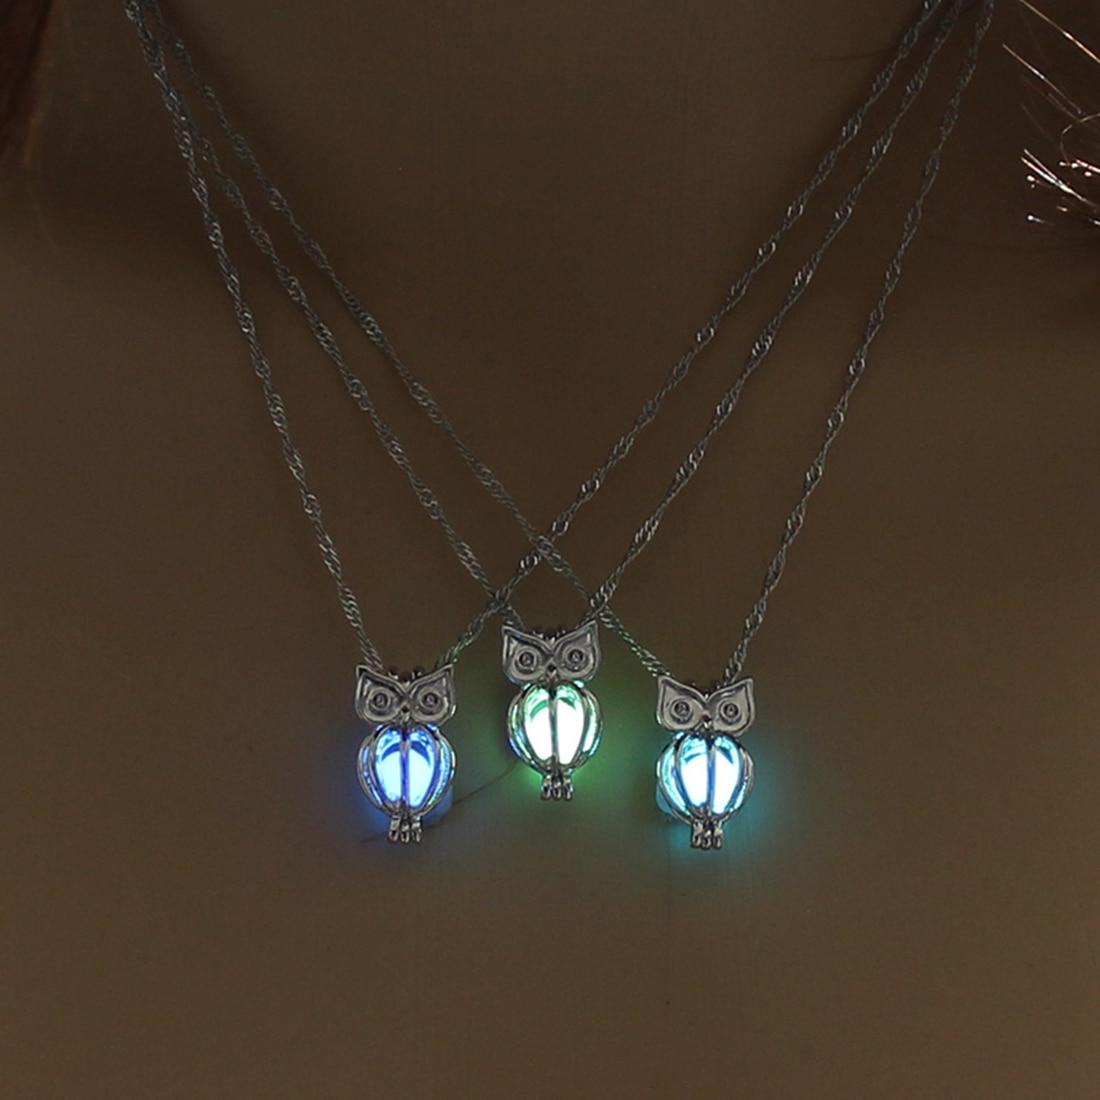 Charm Glowing Owl Pendant Necklace Cute Luminous Jes